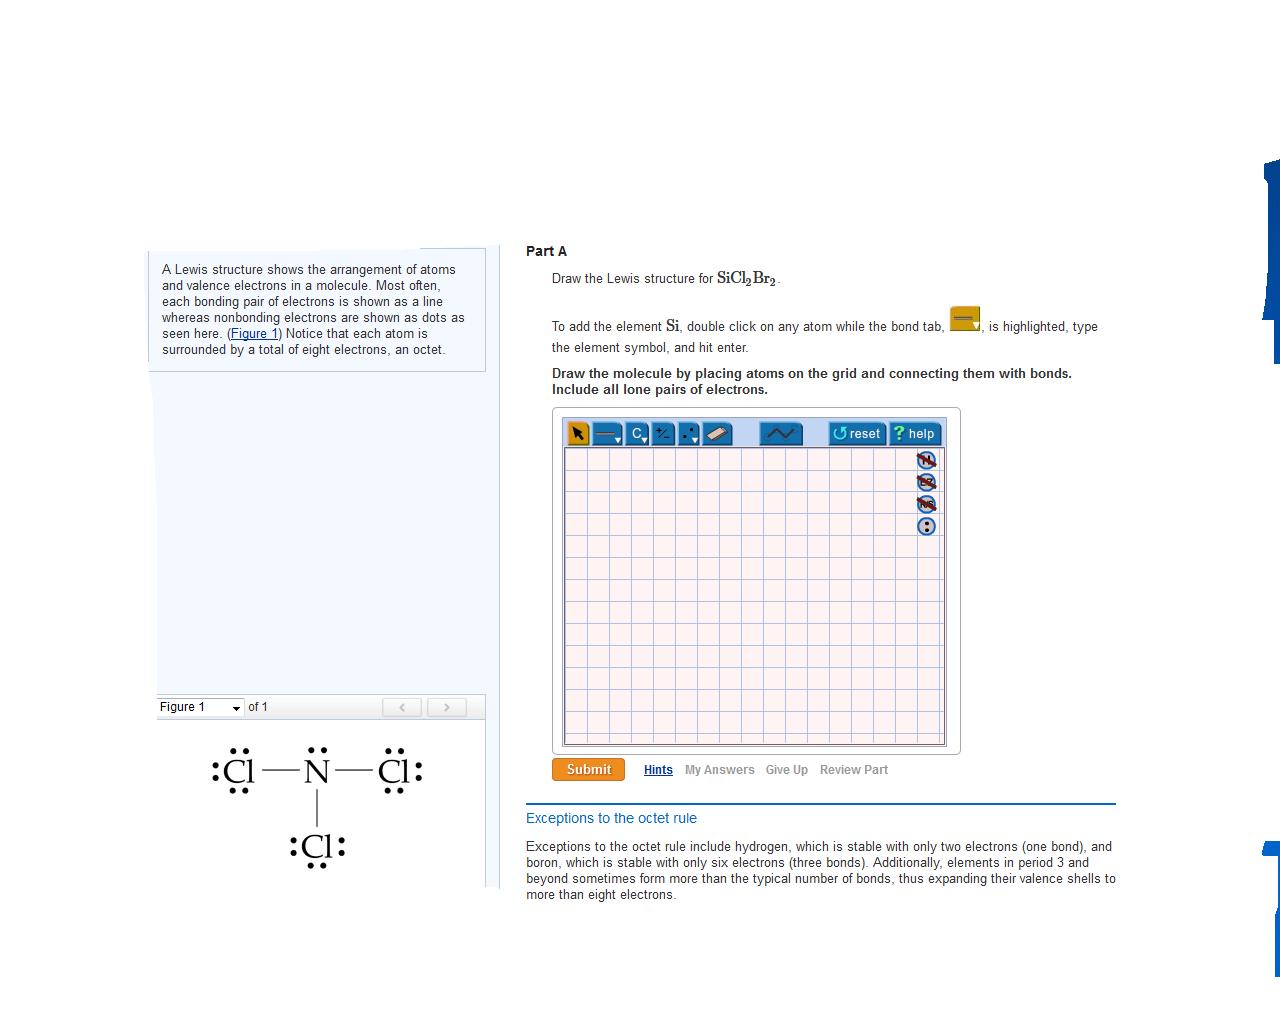 Valance electron diagram homework help : Essay help live chat